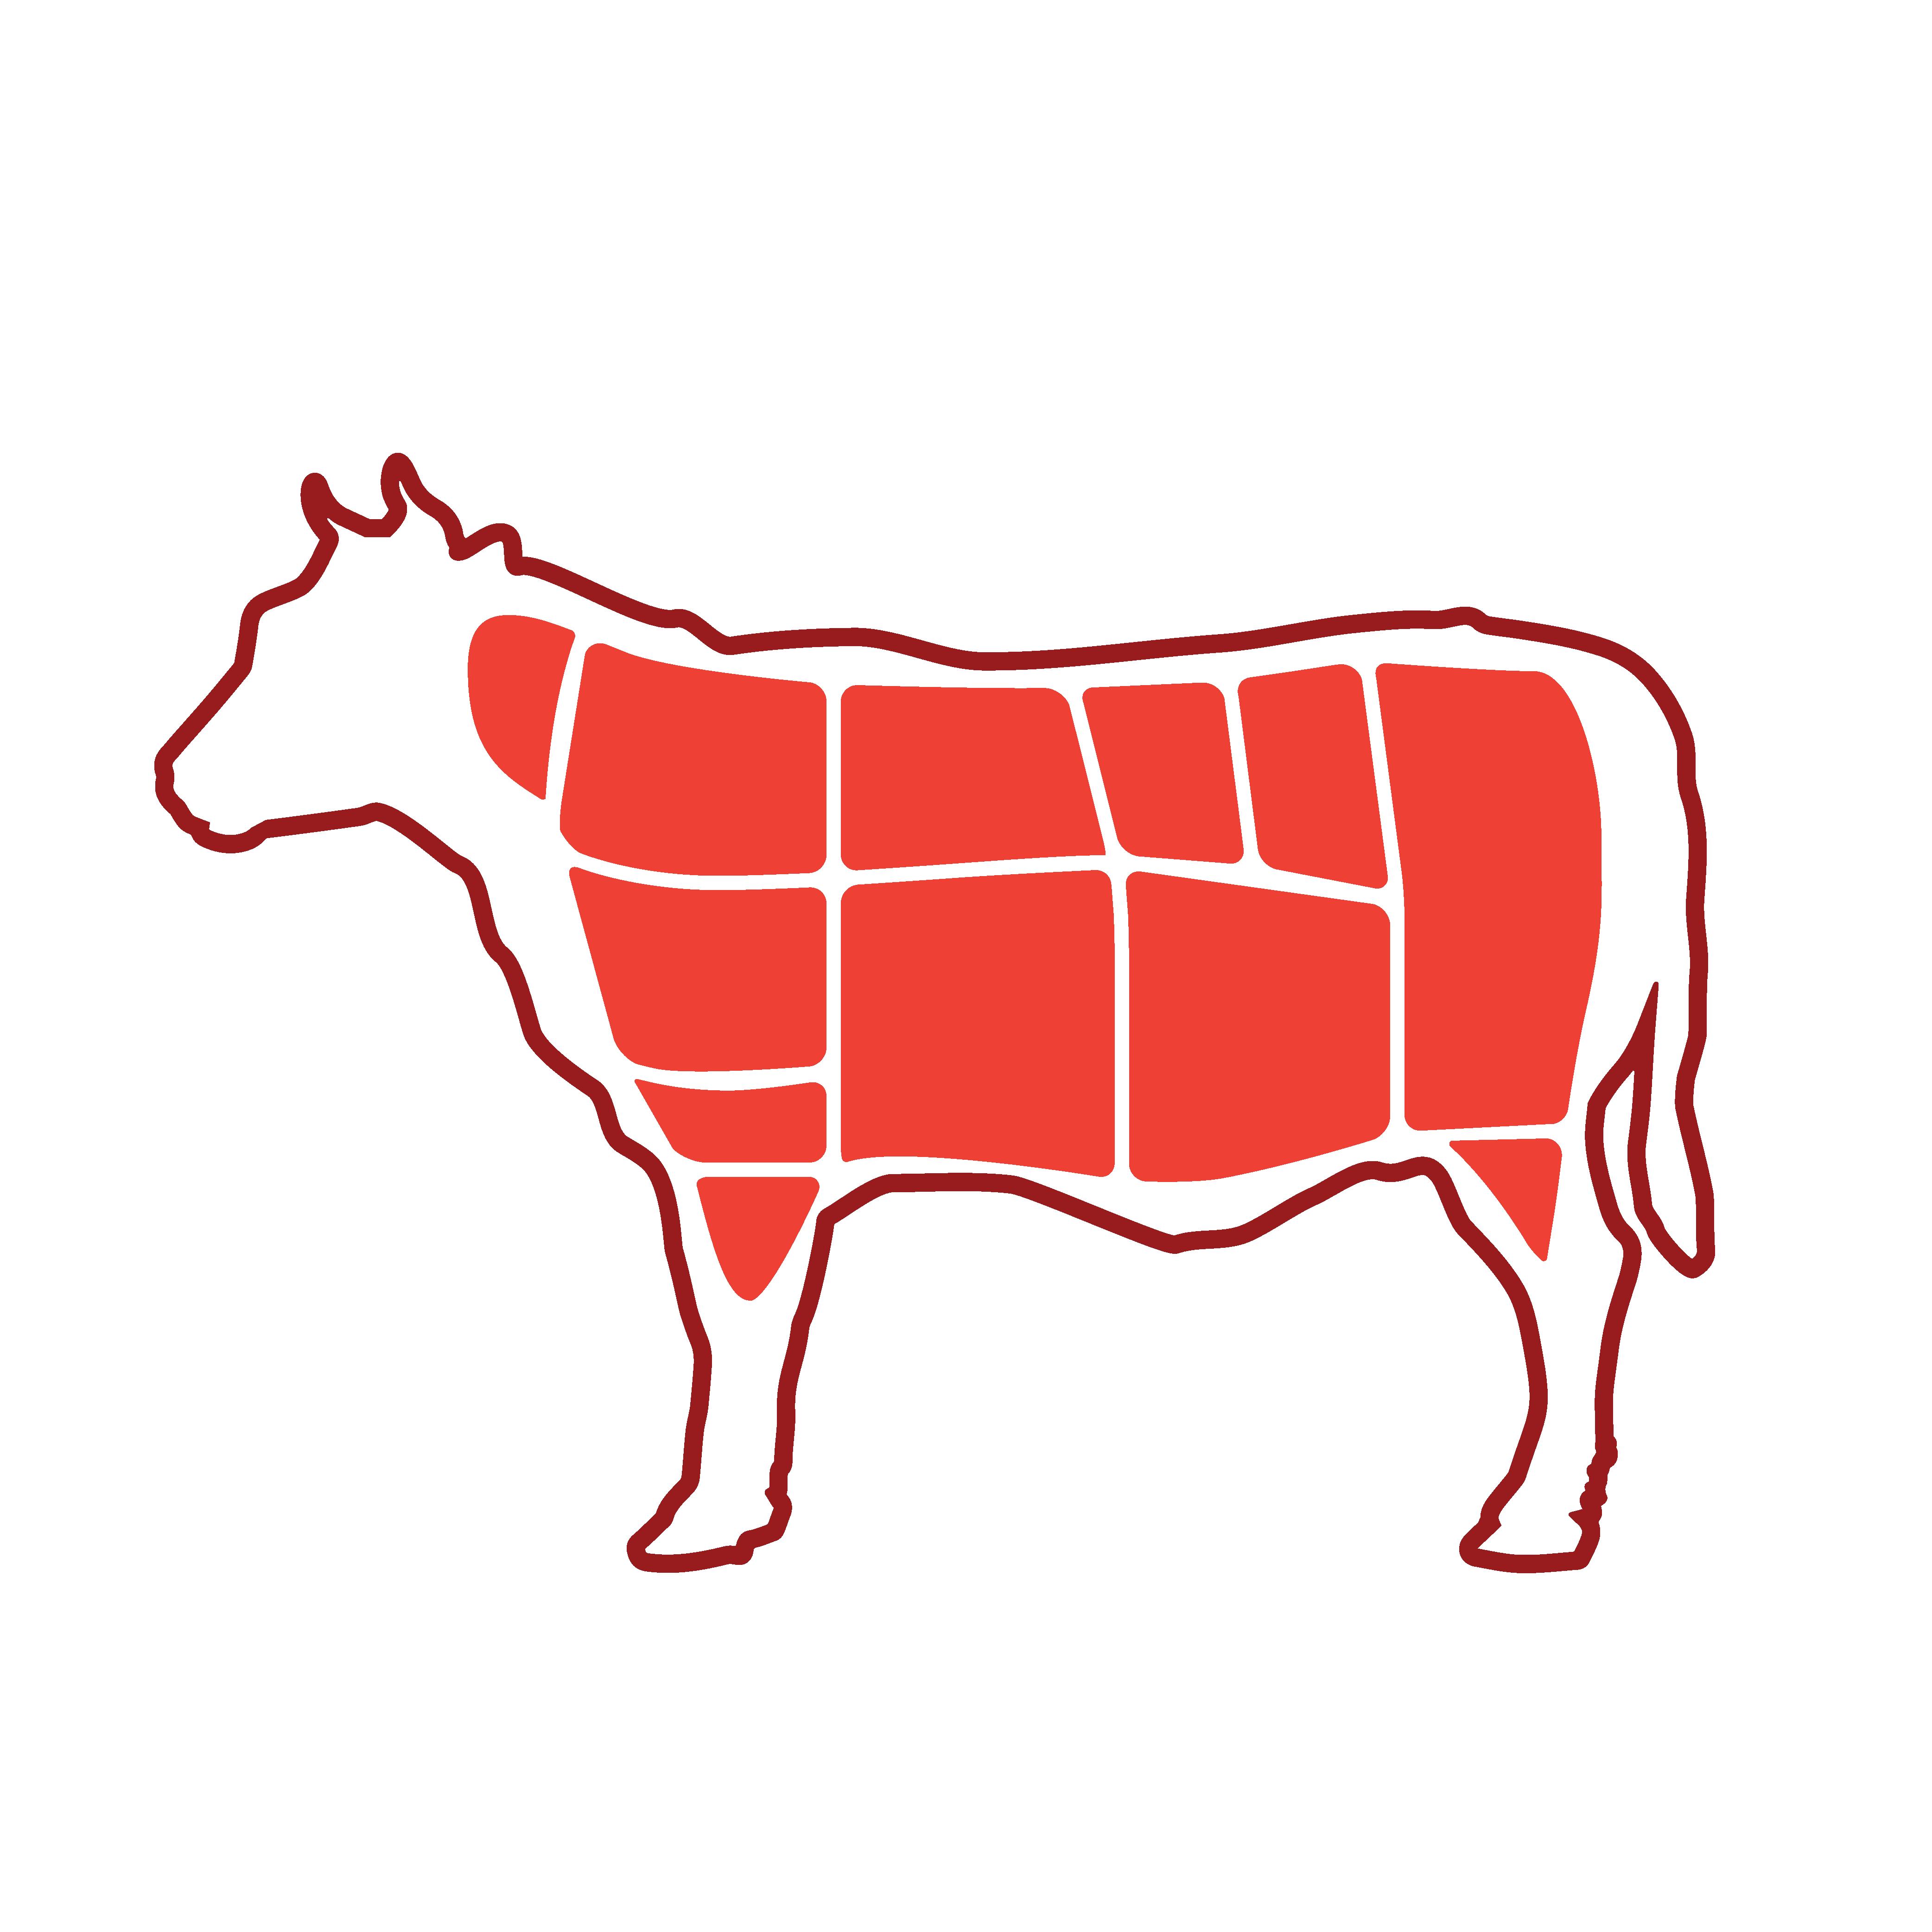 6_Conoce tu carne_Cerdo-05